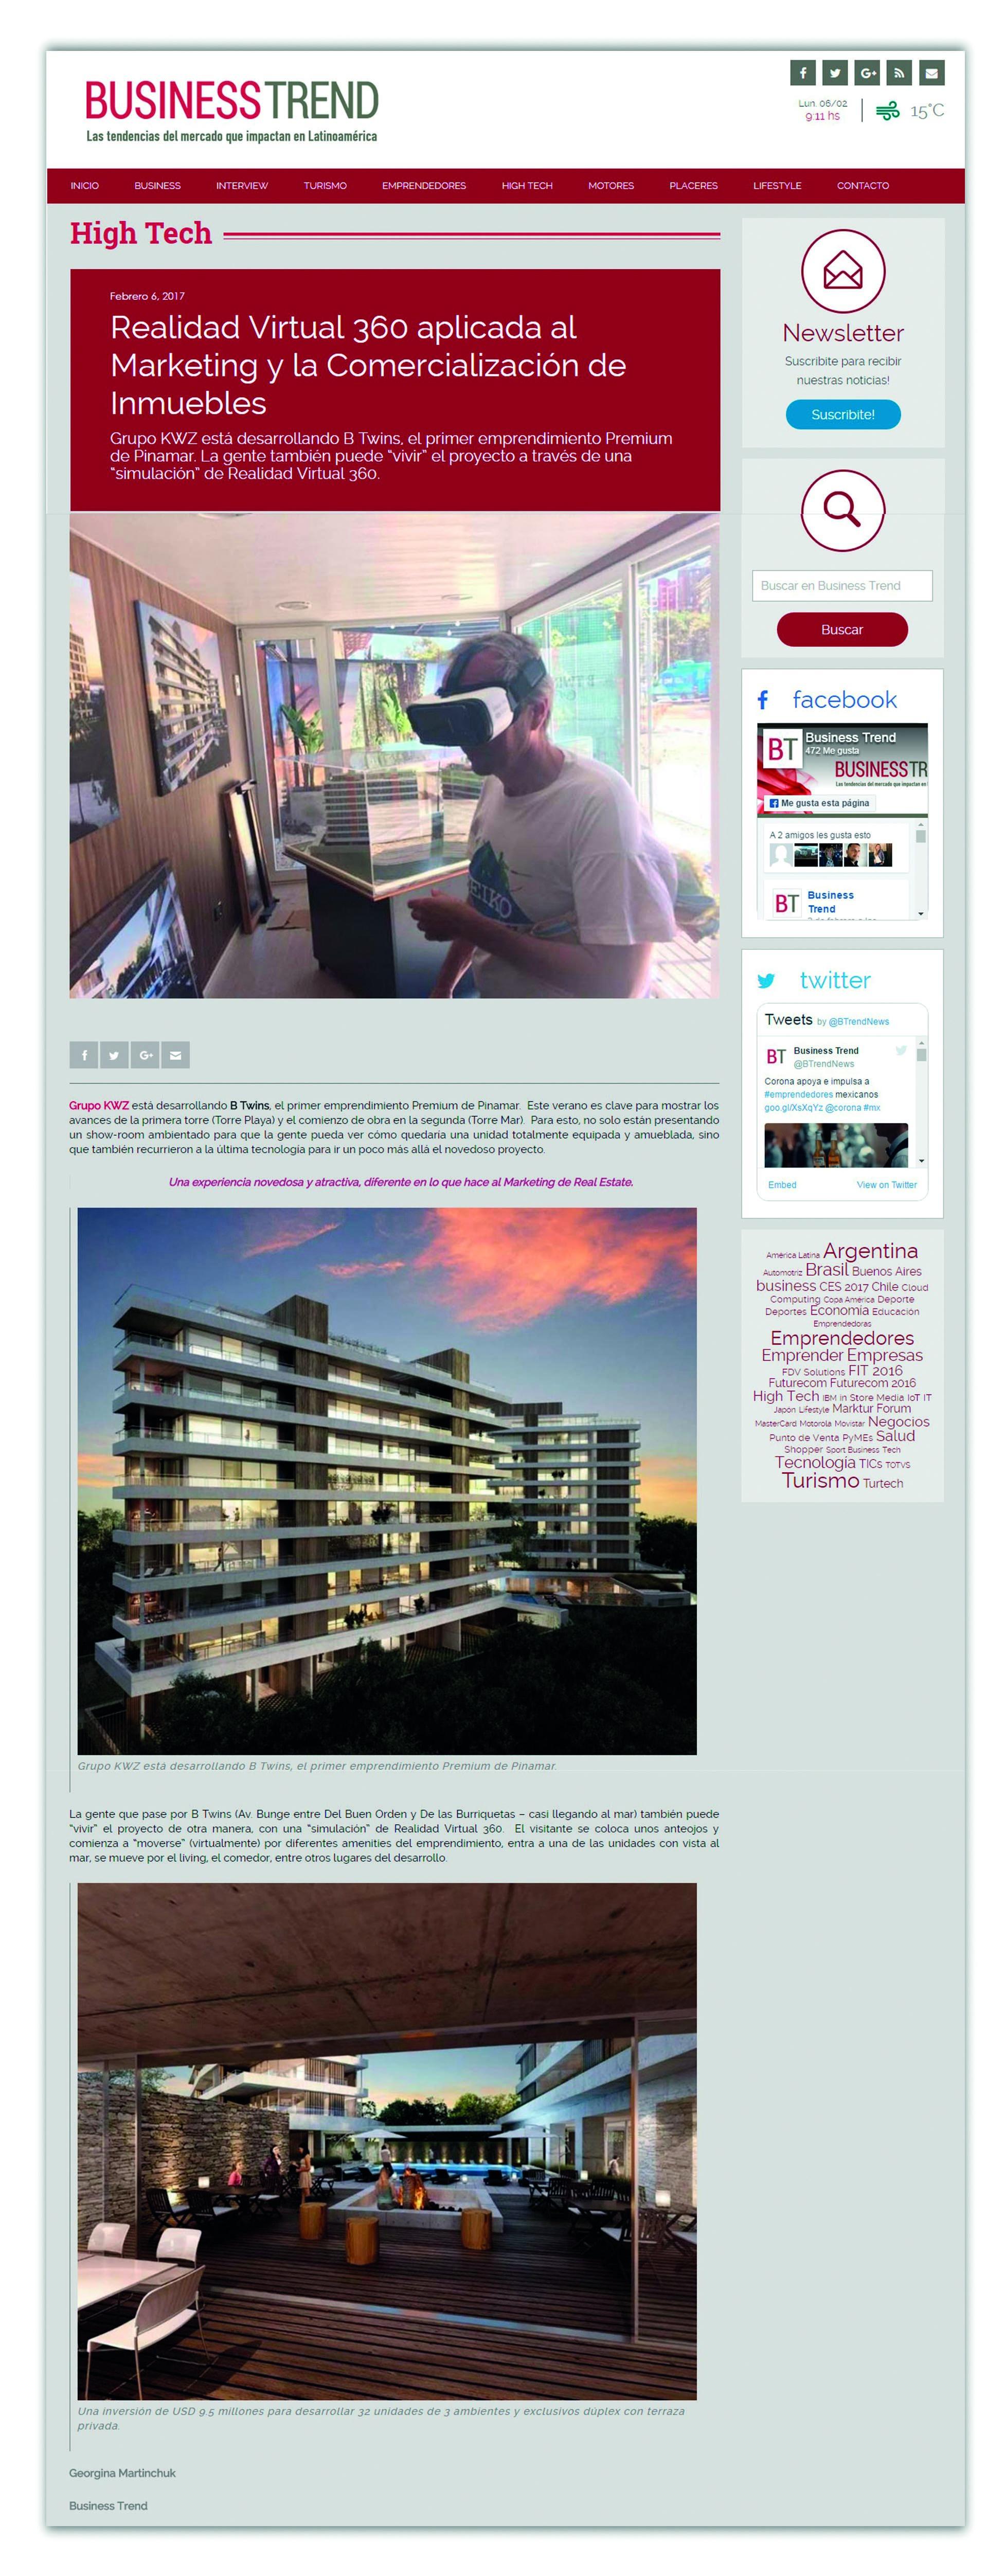 06-02-17 BusinessTrend (B Twins - Realidad Virtual en Pinamar).jpg